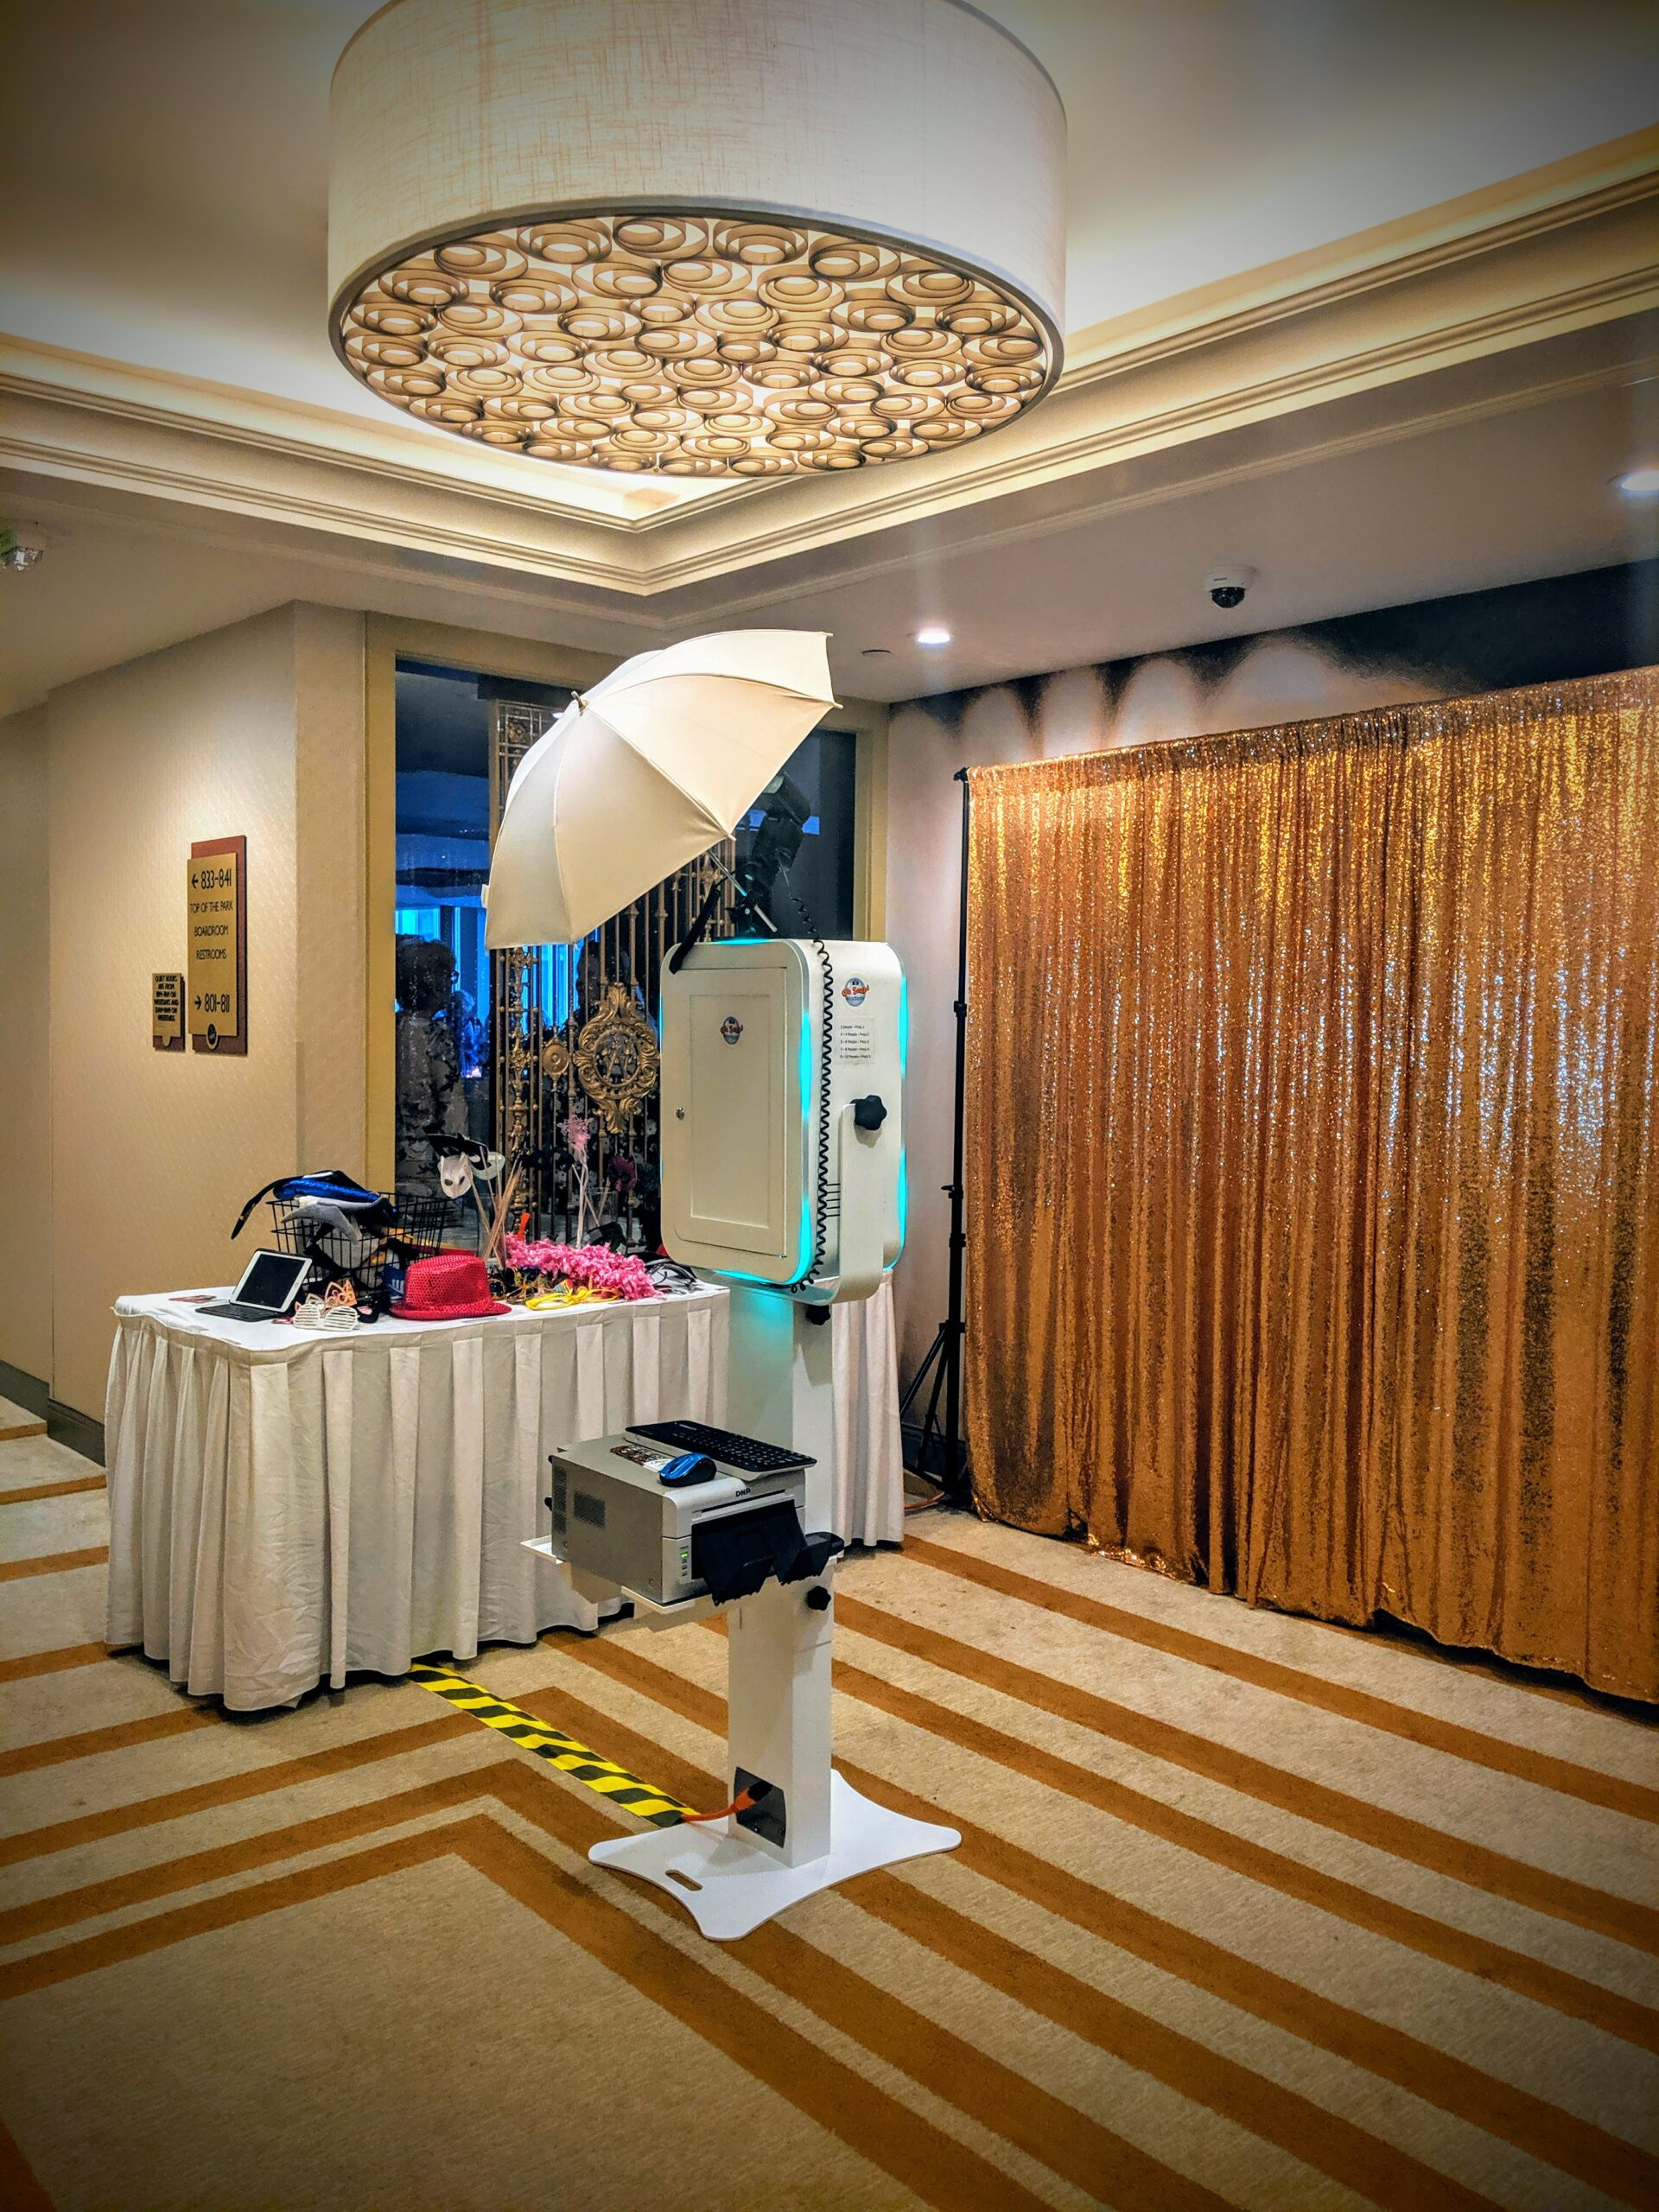 Photo booth equipment